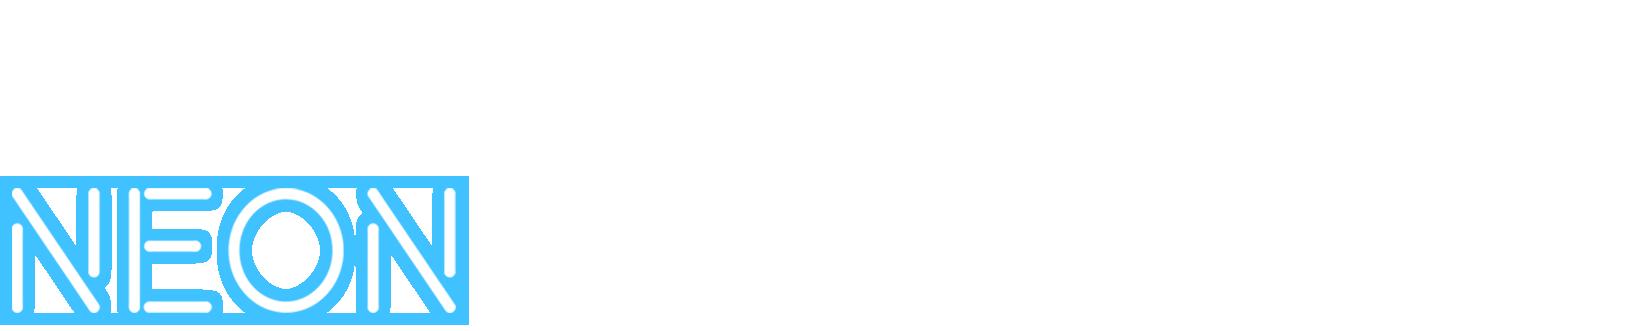 FiXT Neon: New Releases Logo